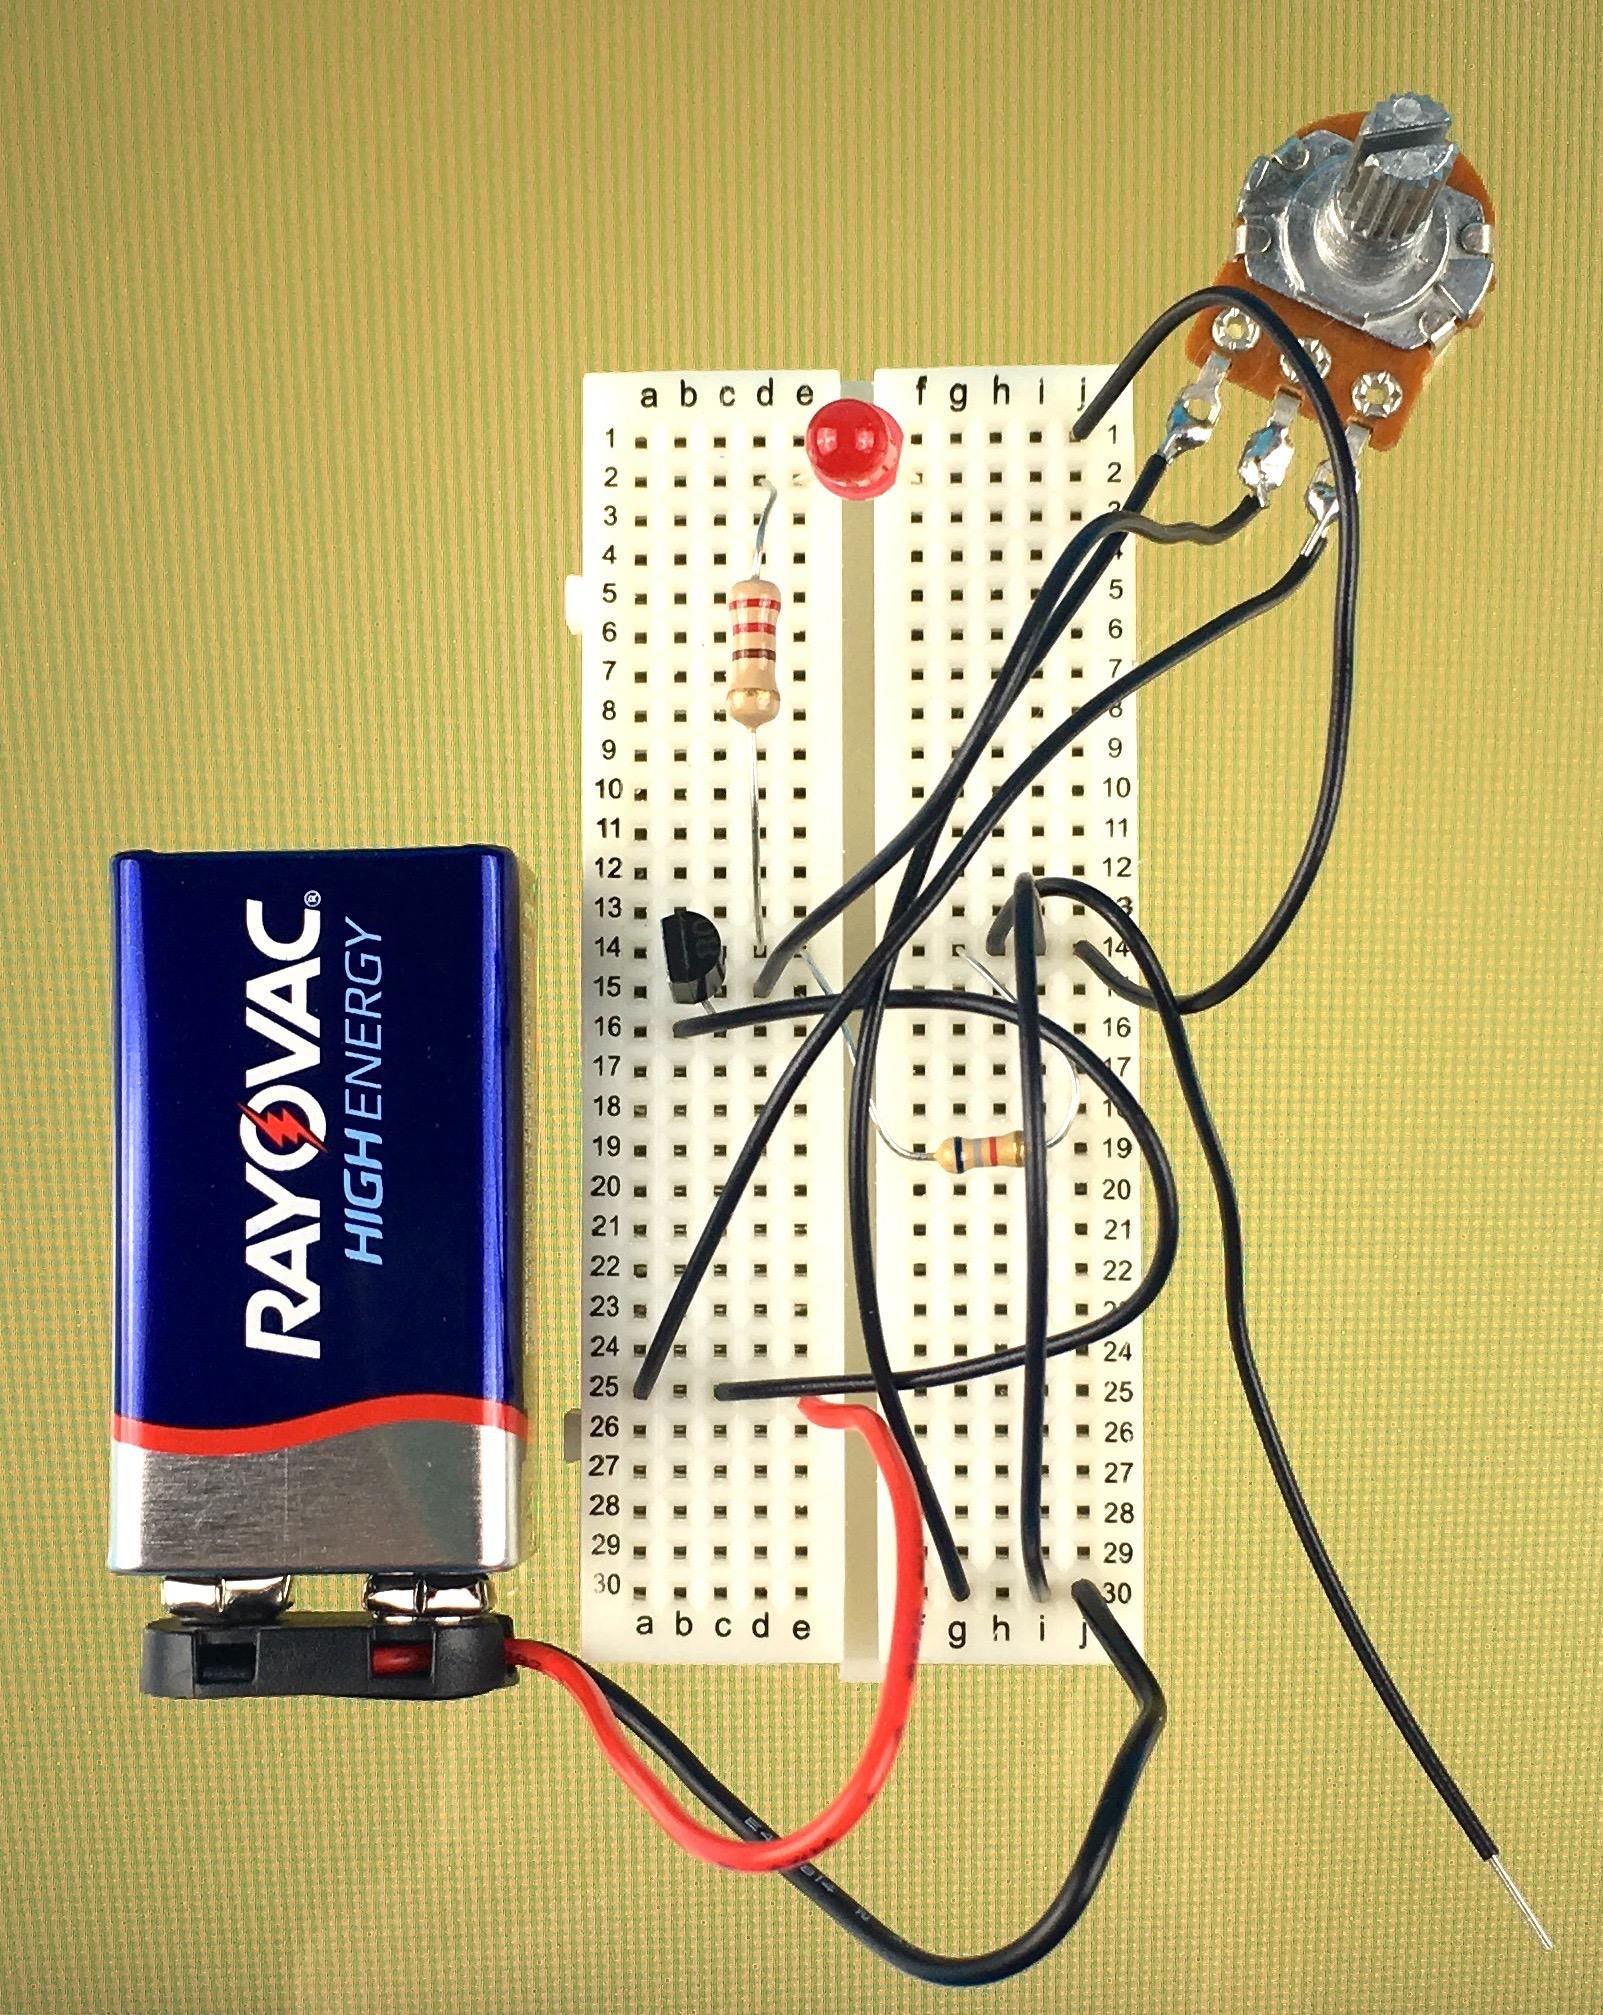 The Basics Lab 18 - dc to dc power supply